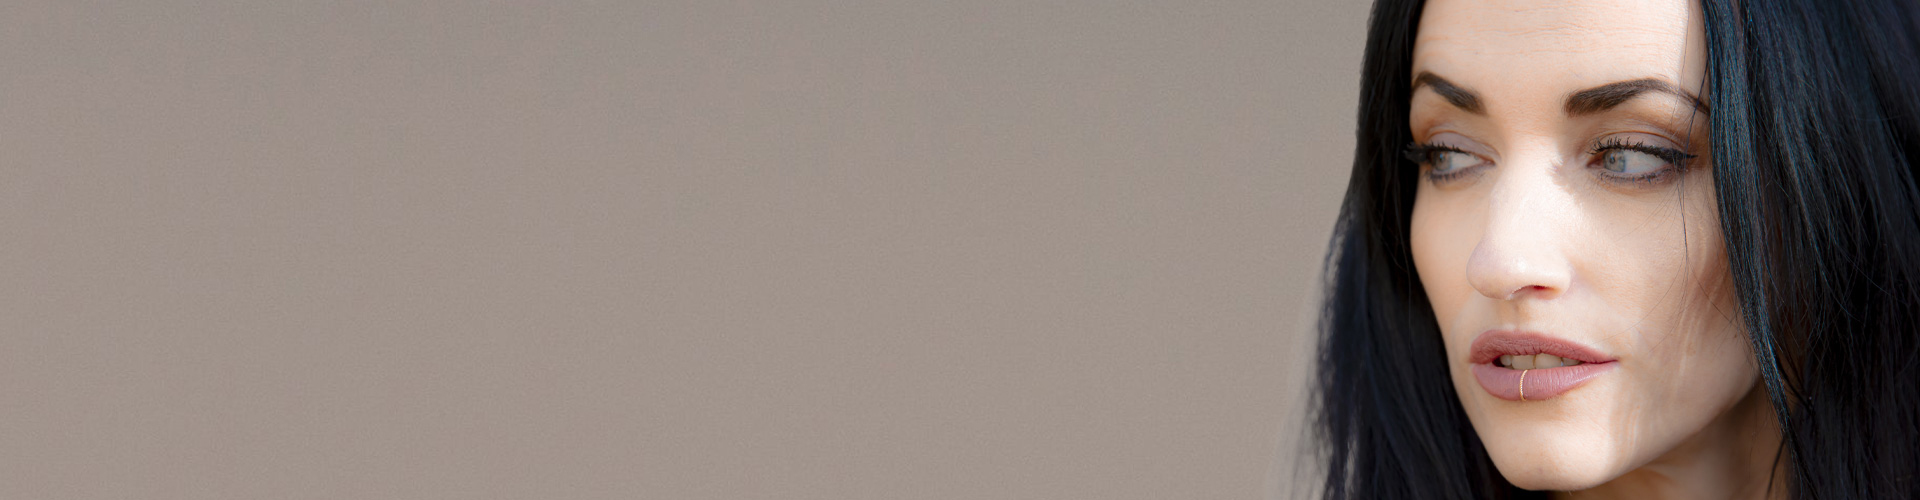 Piercing Lèvre Anneau | Popart Piercing